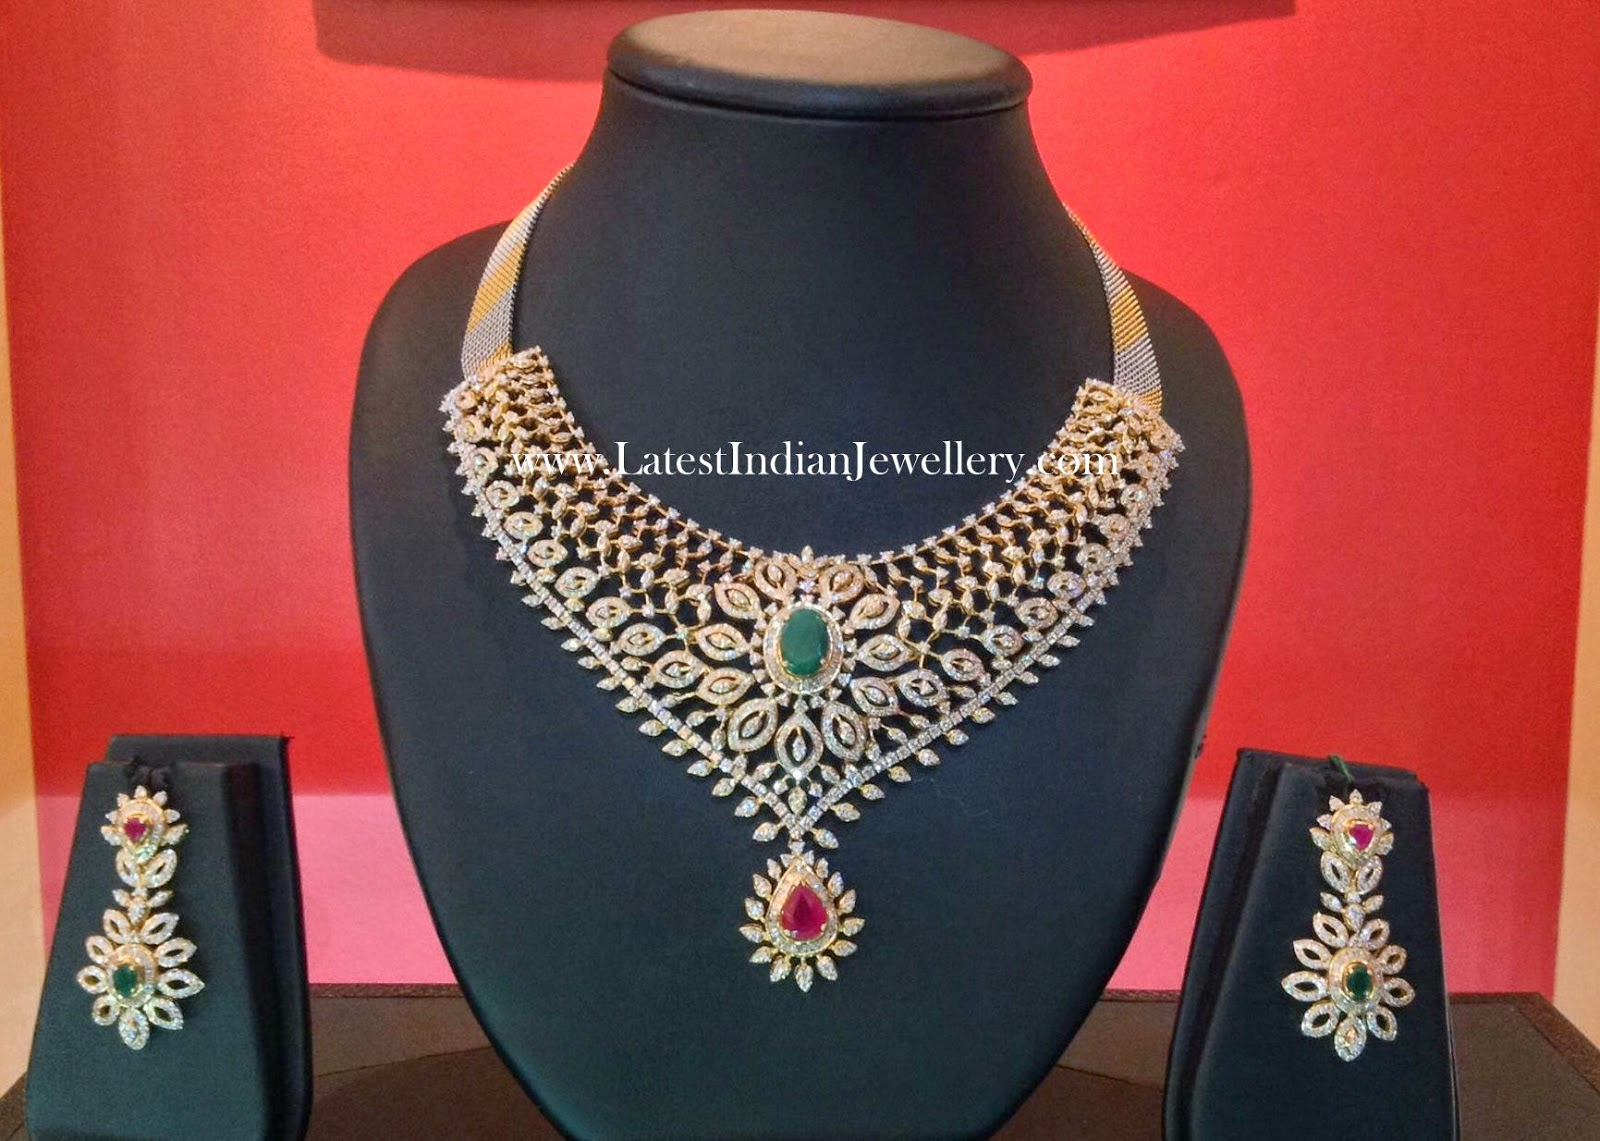 Tanmai Jewellers Diamond Choker Necklace